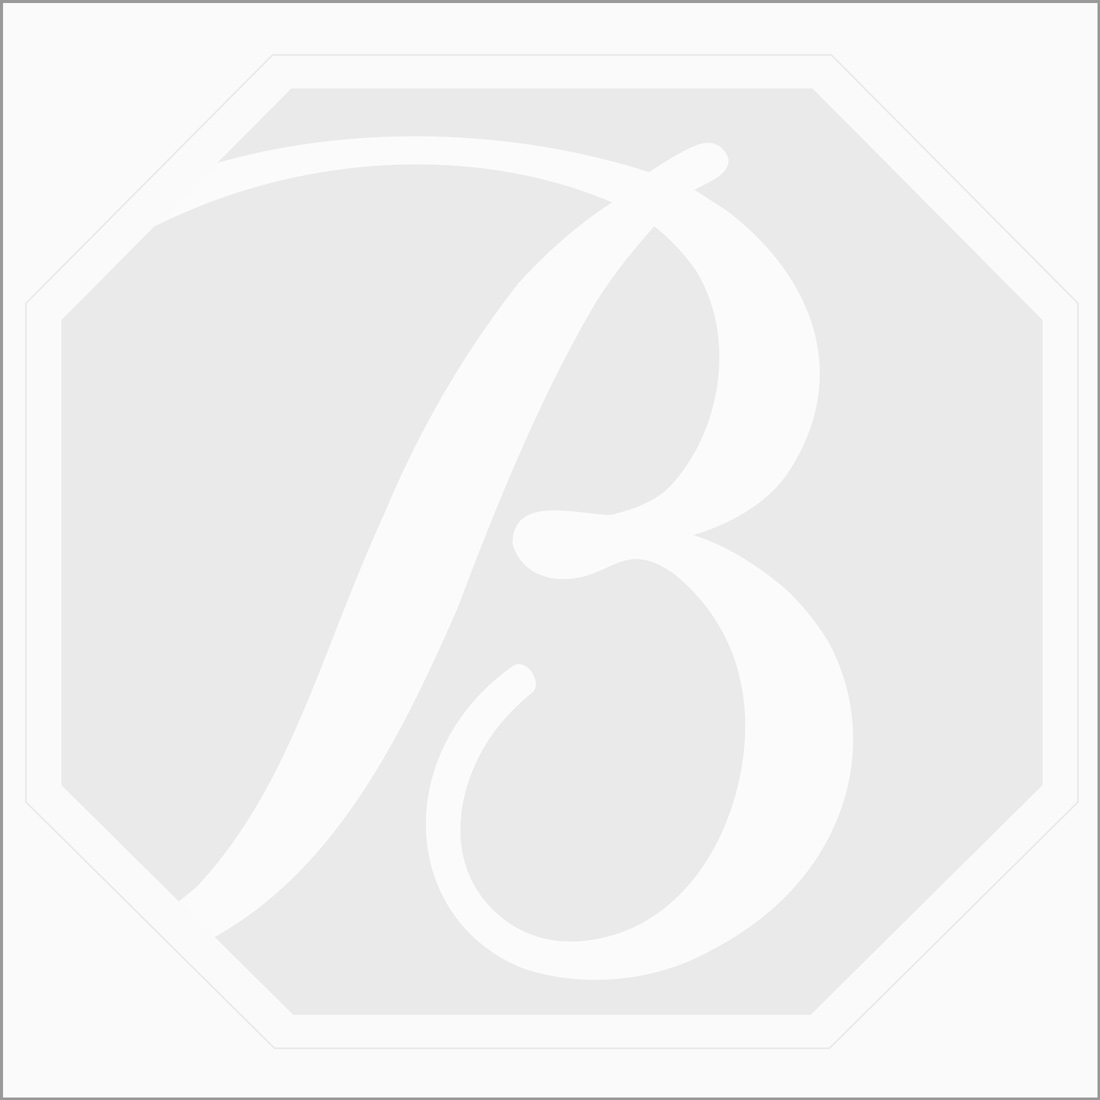 2 Black Diamond Cushion Shape Rose Cut Diamonds - 18.97 cts. (DRC1201)